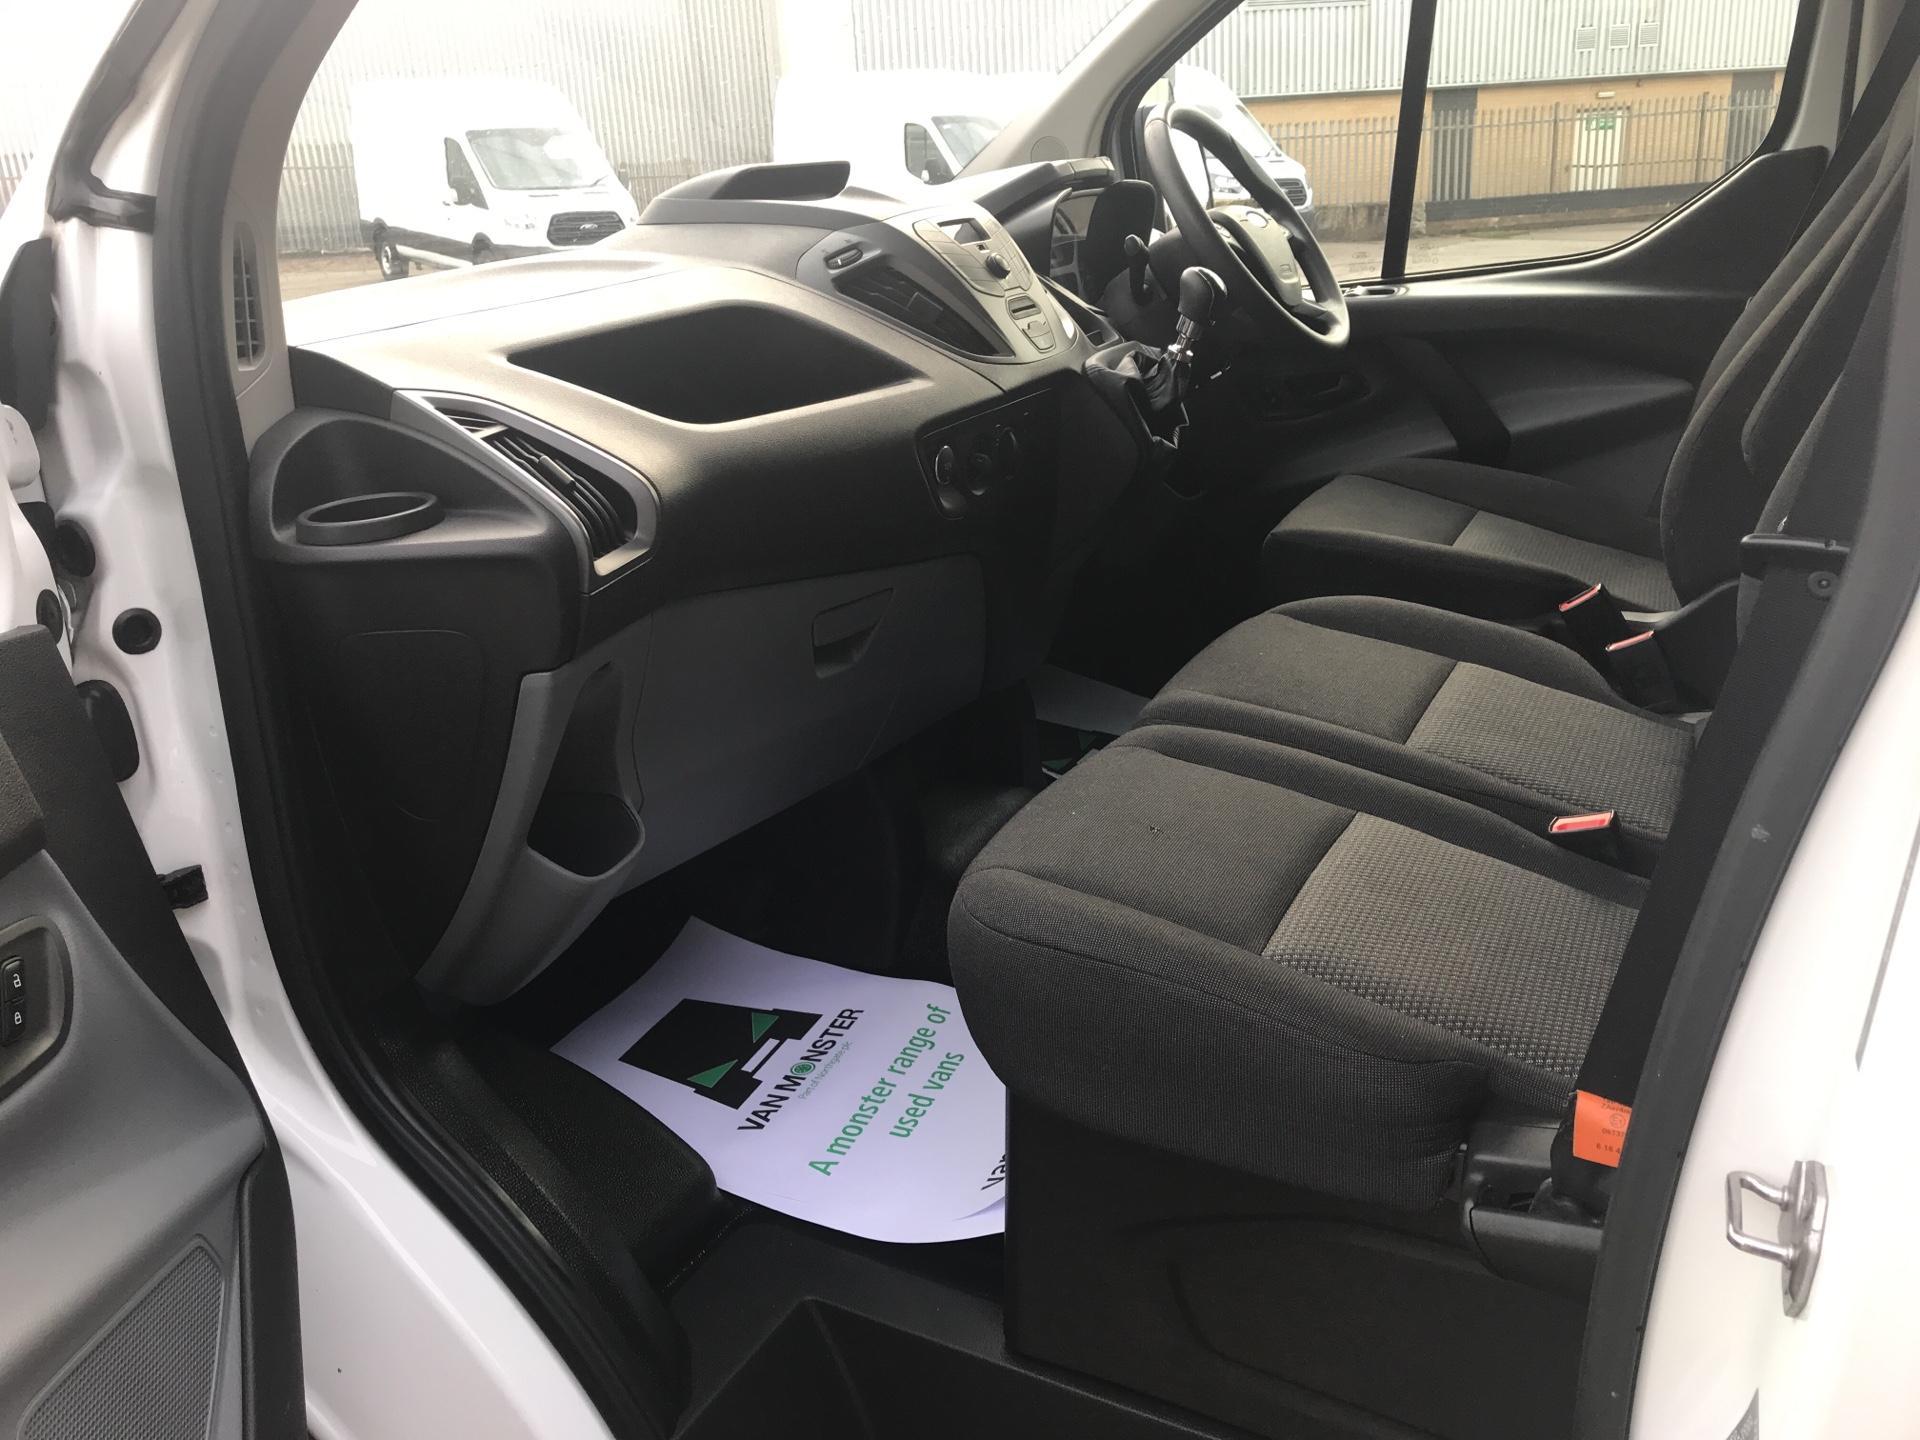 2016 Ford Transit Custom 290 L1 DIESEL FWD 2.2 TDCI 100PS LOW ROOF VAN EURO 5 (NU66HJX) Image 14